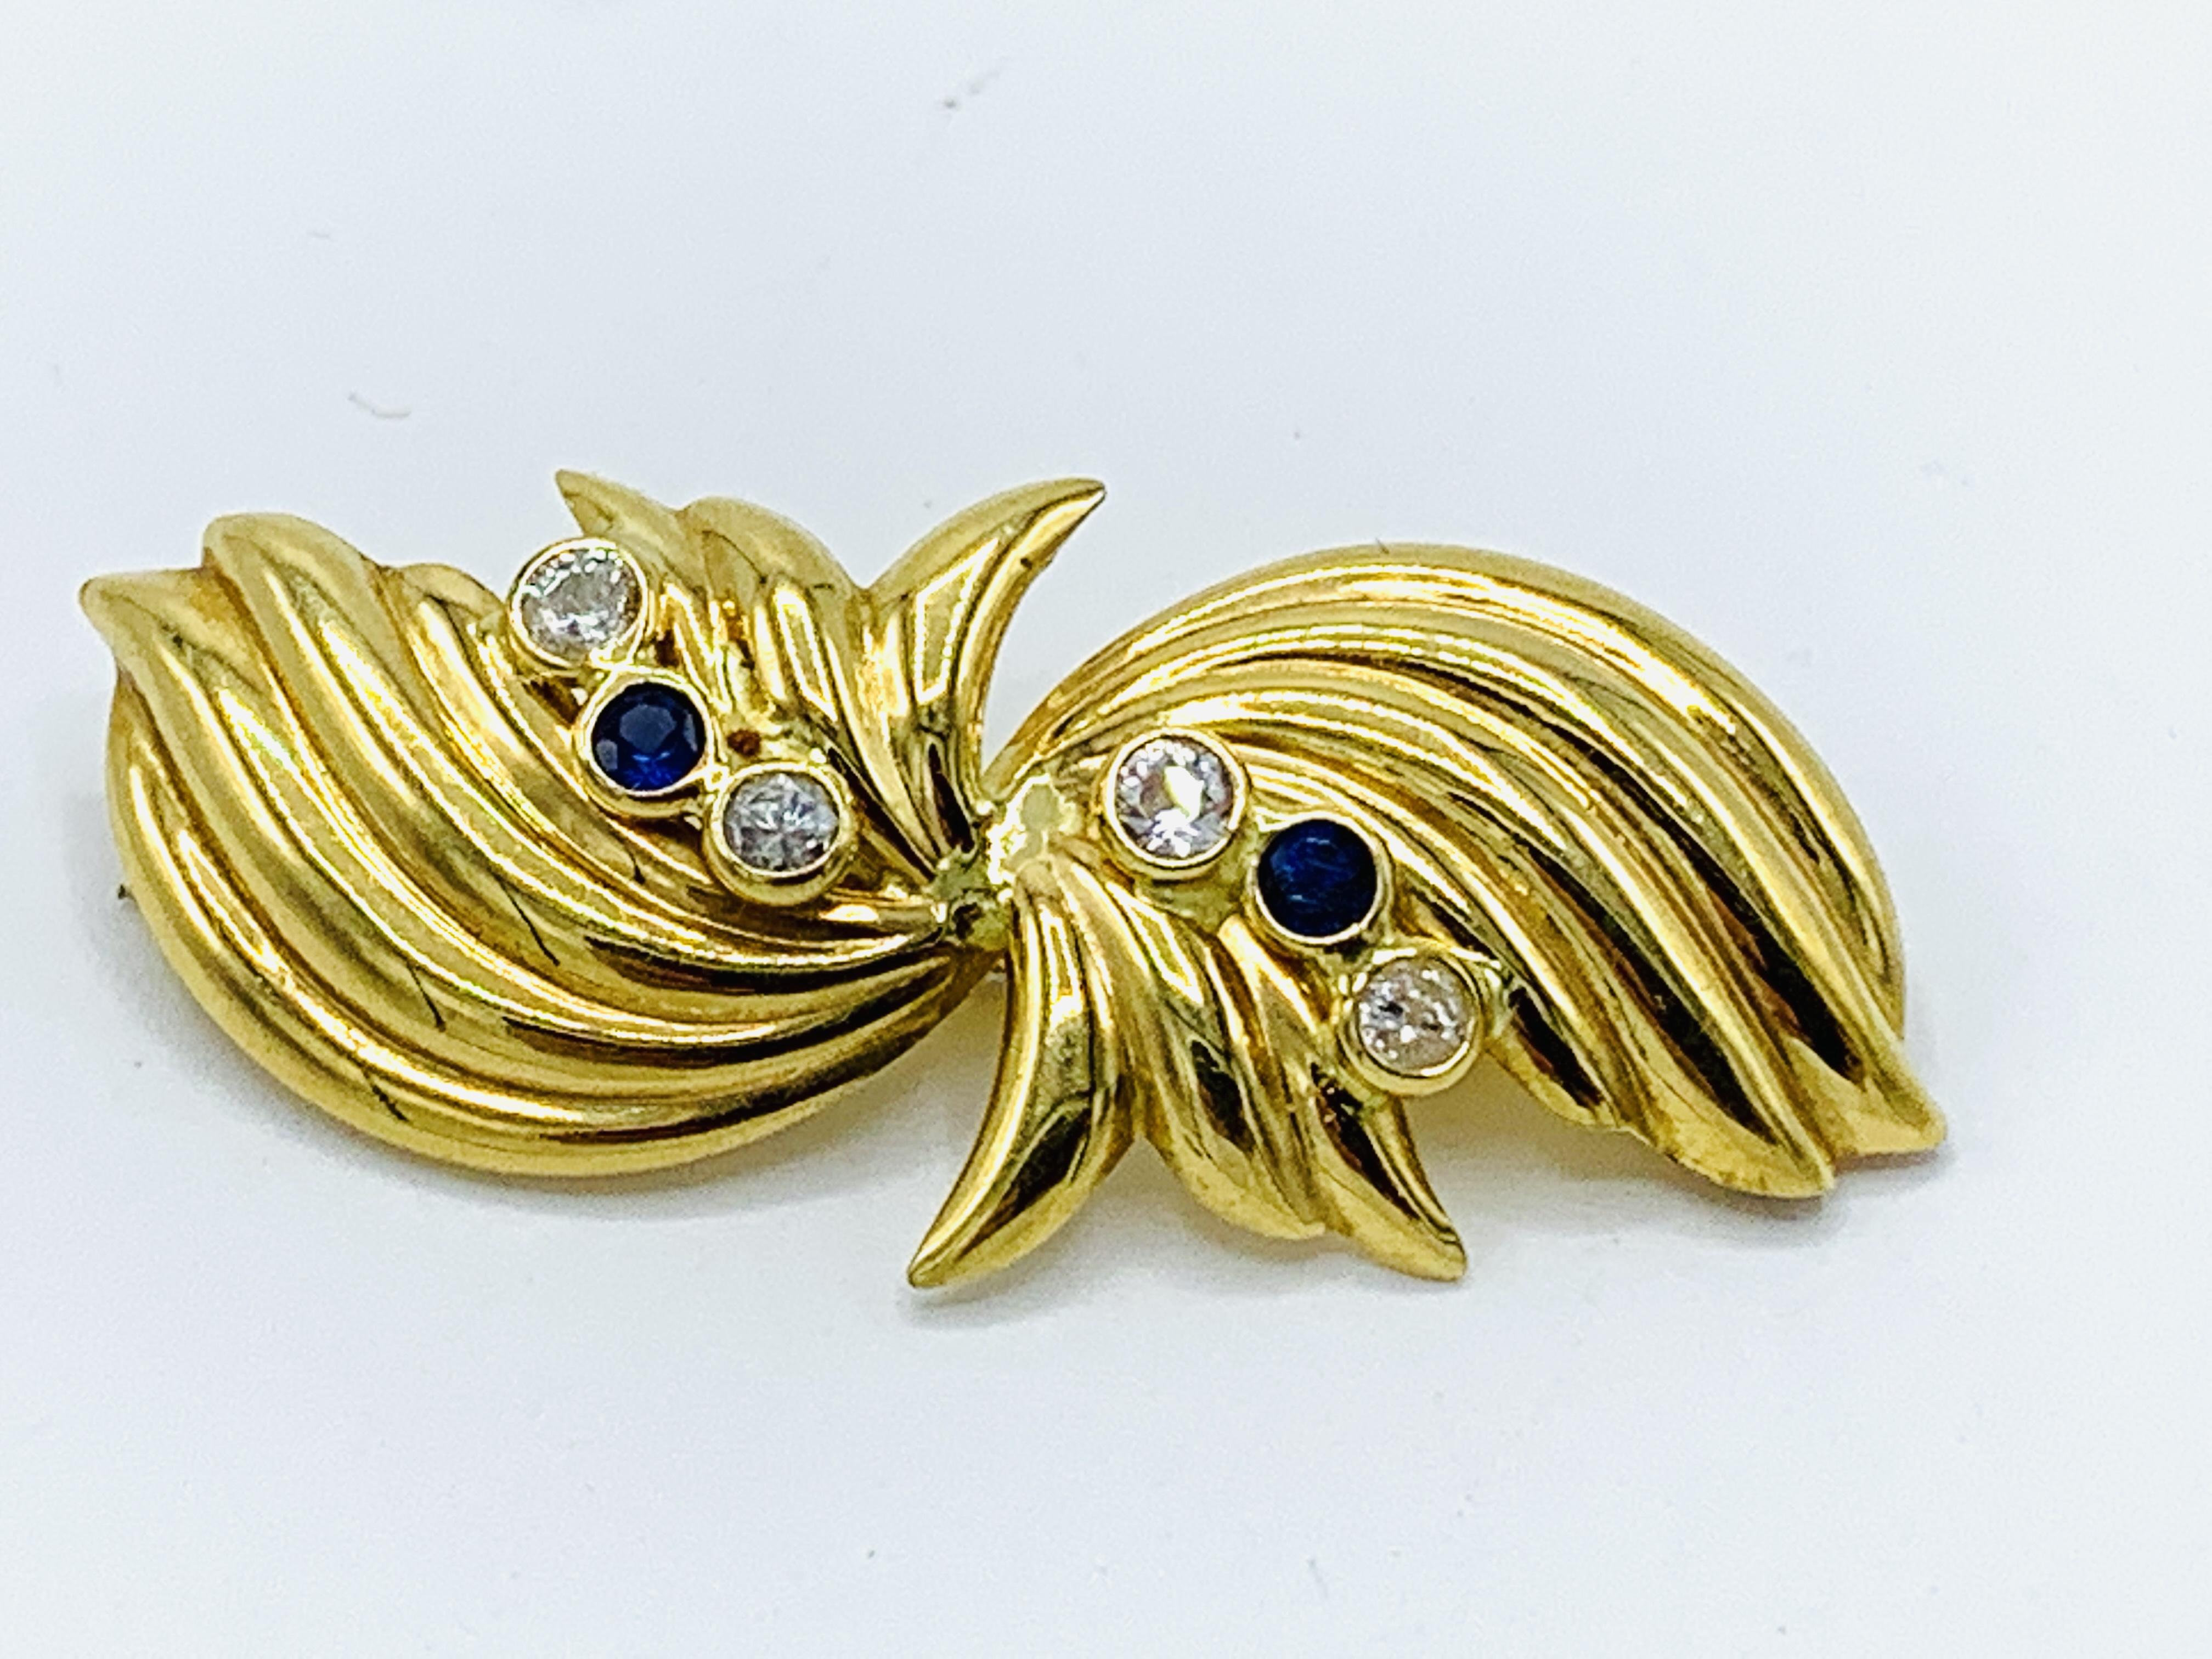 Contemporary Italian bow design 18ct gold brooch